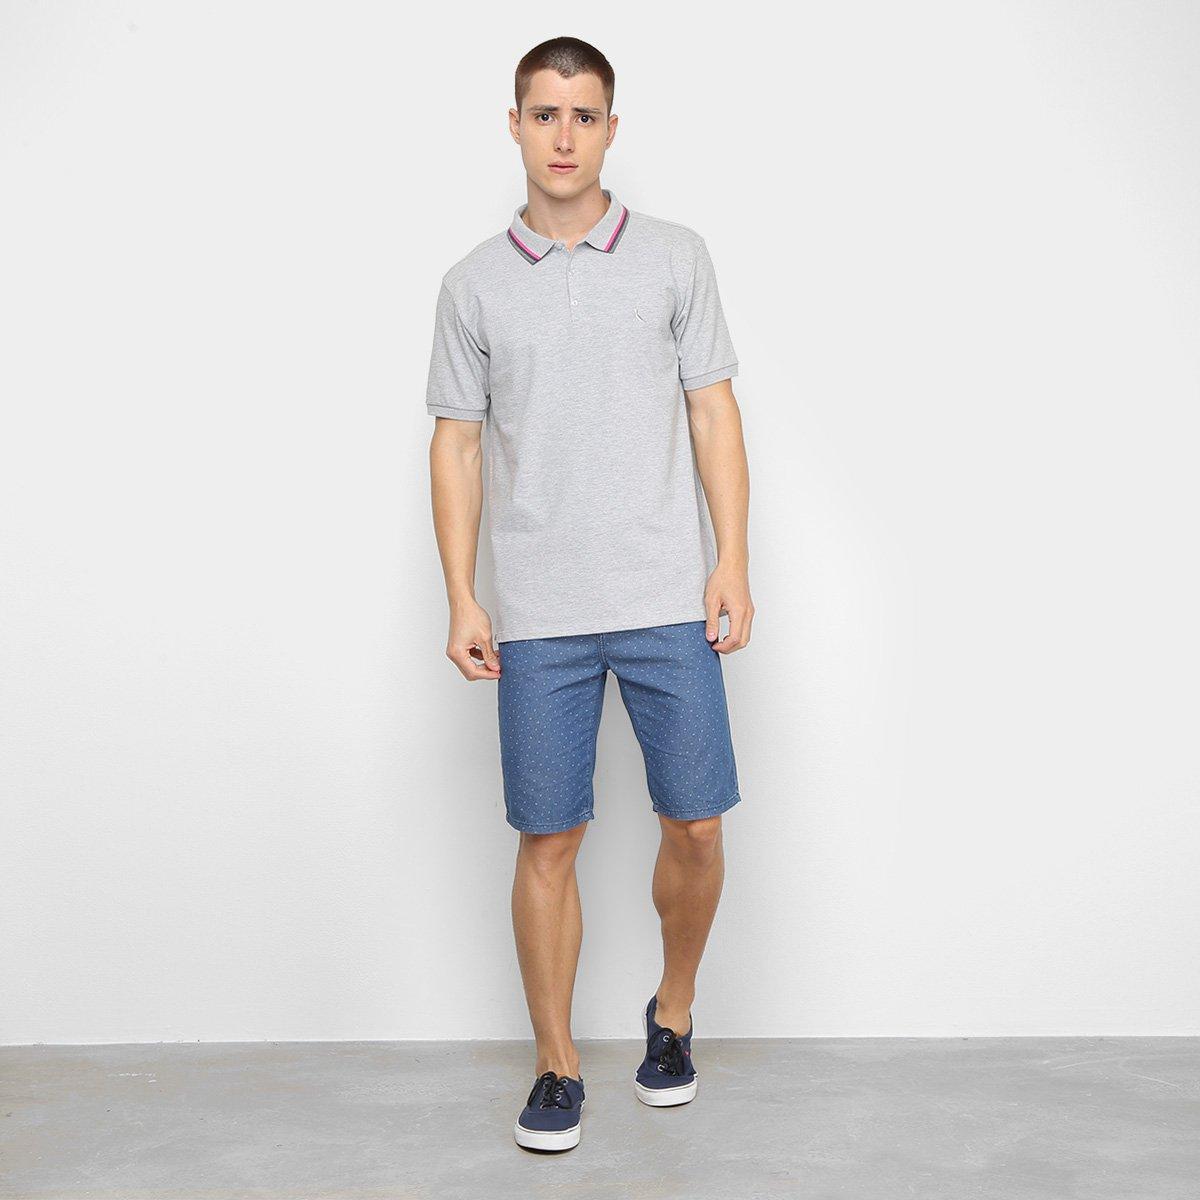 Camisa Polo Reserva Novo Friso Masculina - Mescla